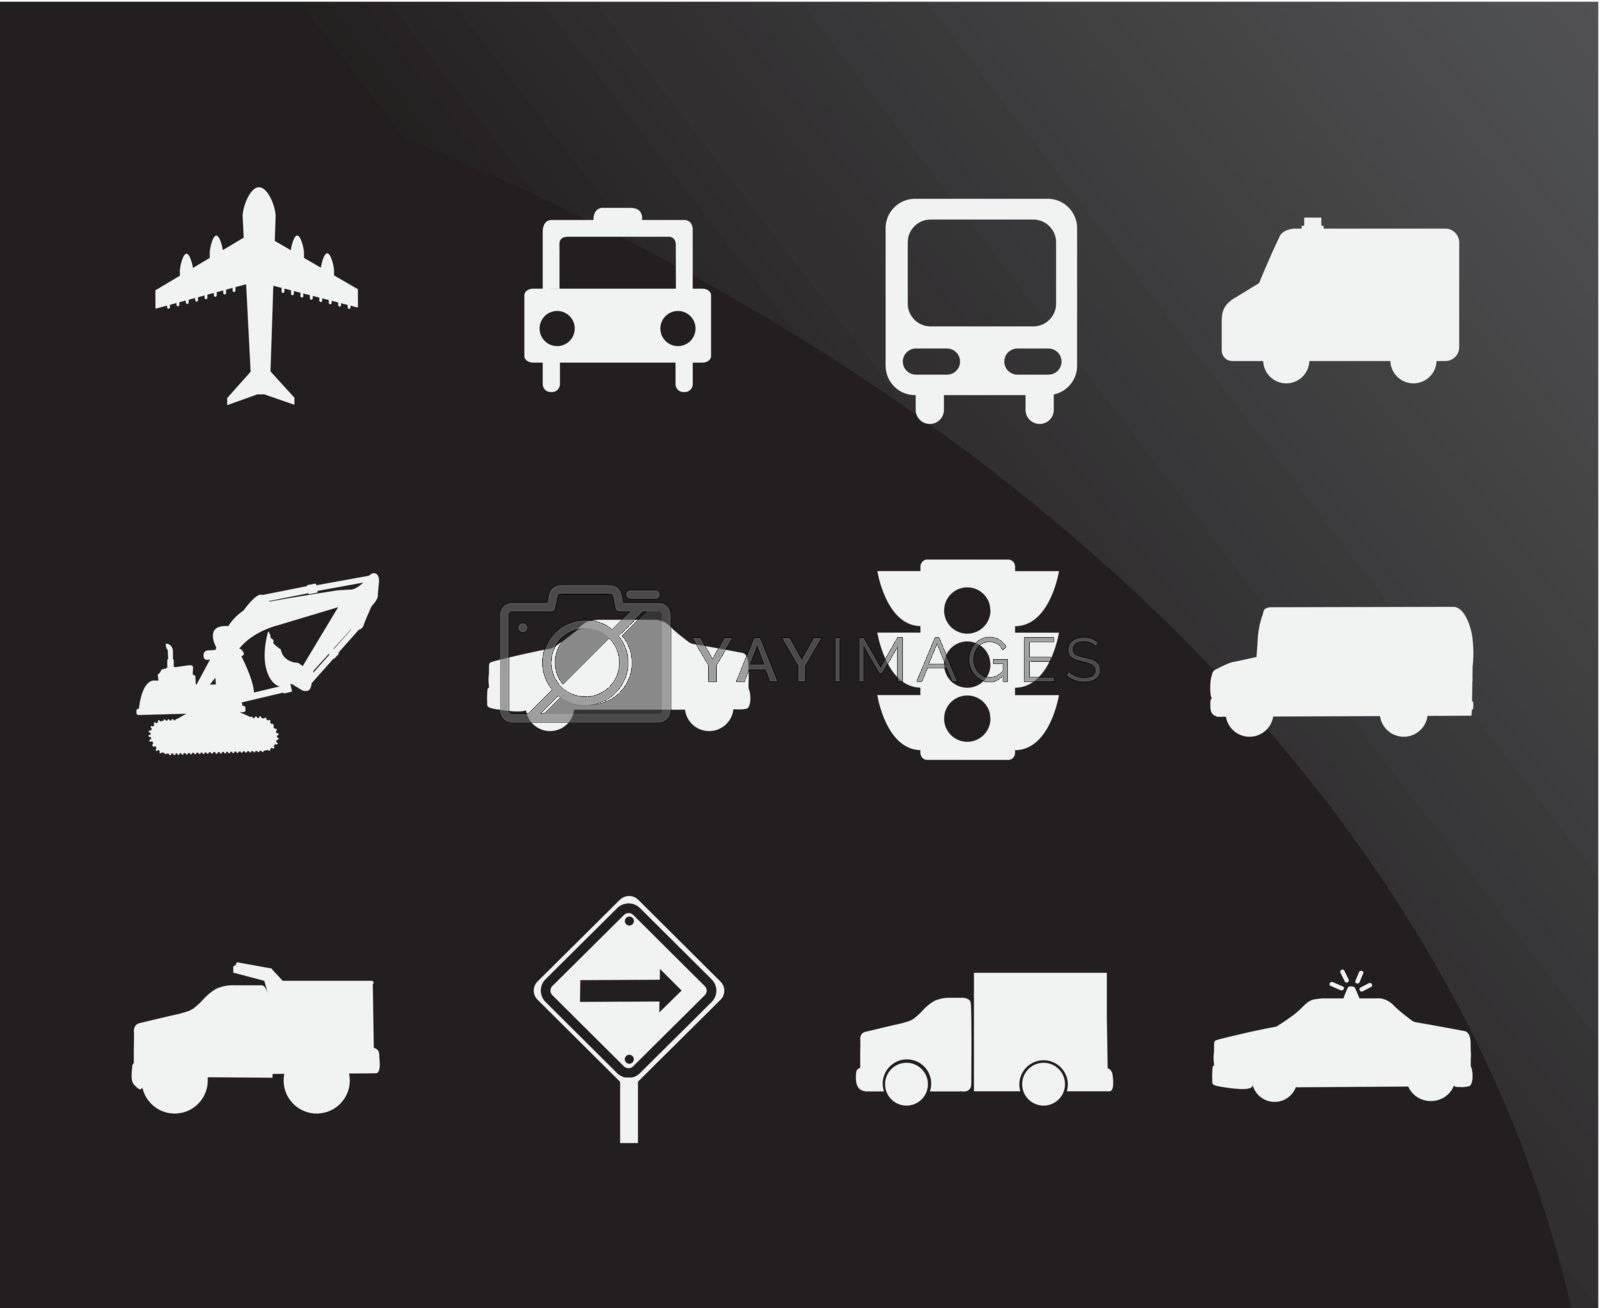 Transportation icons over black background vector illustration